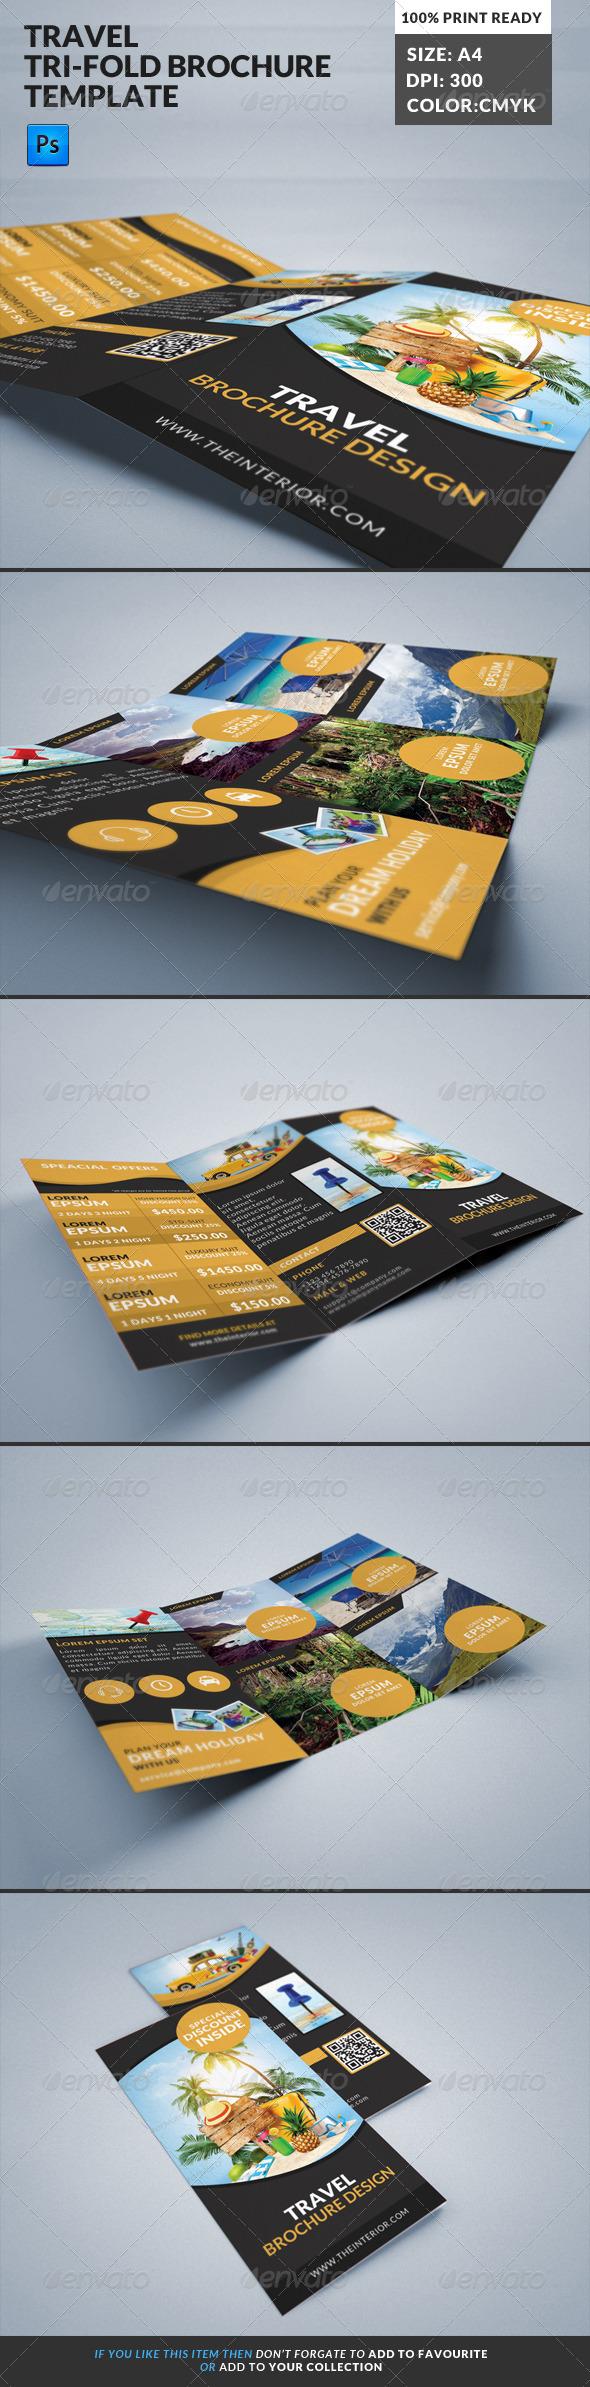 GraphicRiver Travel Tourism Tri-Fold Brochure 7974106